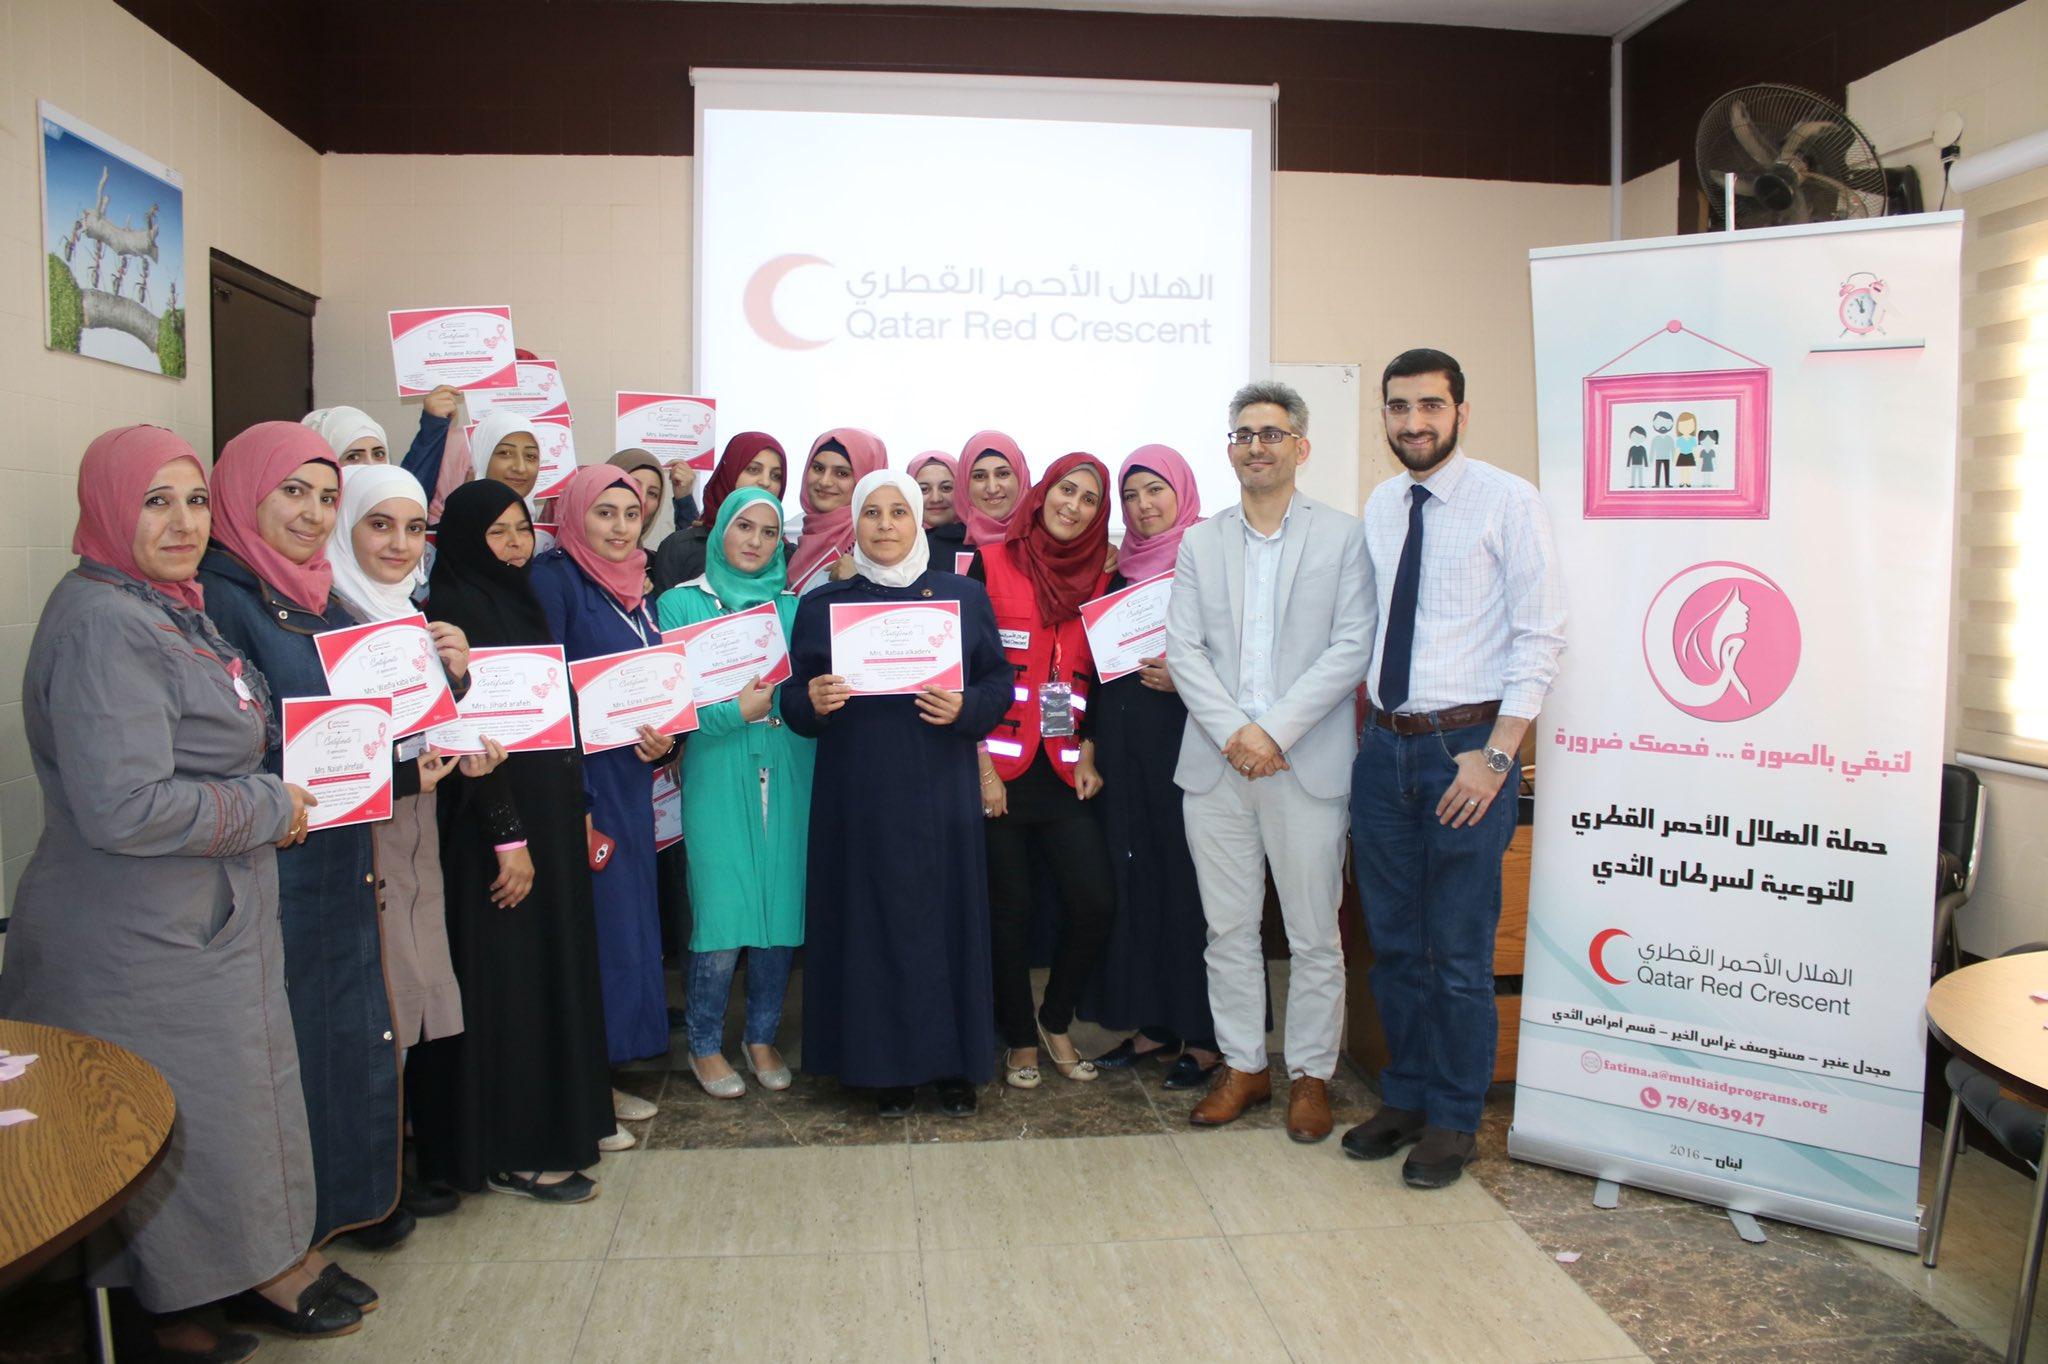 QRCS Promotes Public Awareness Against Breast Cancer